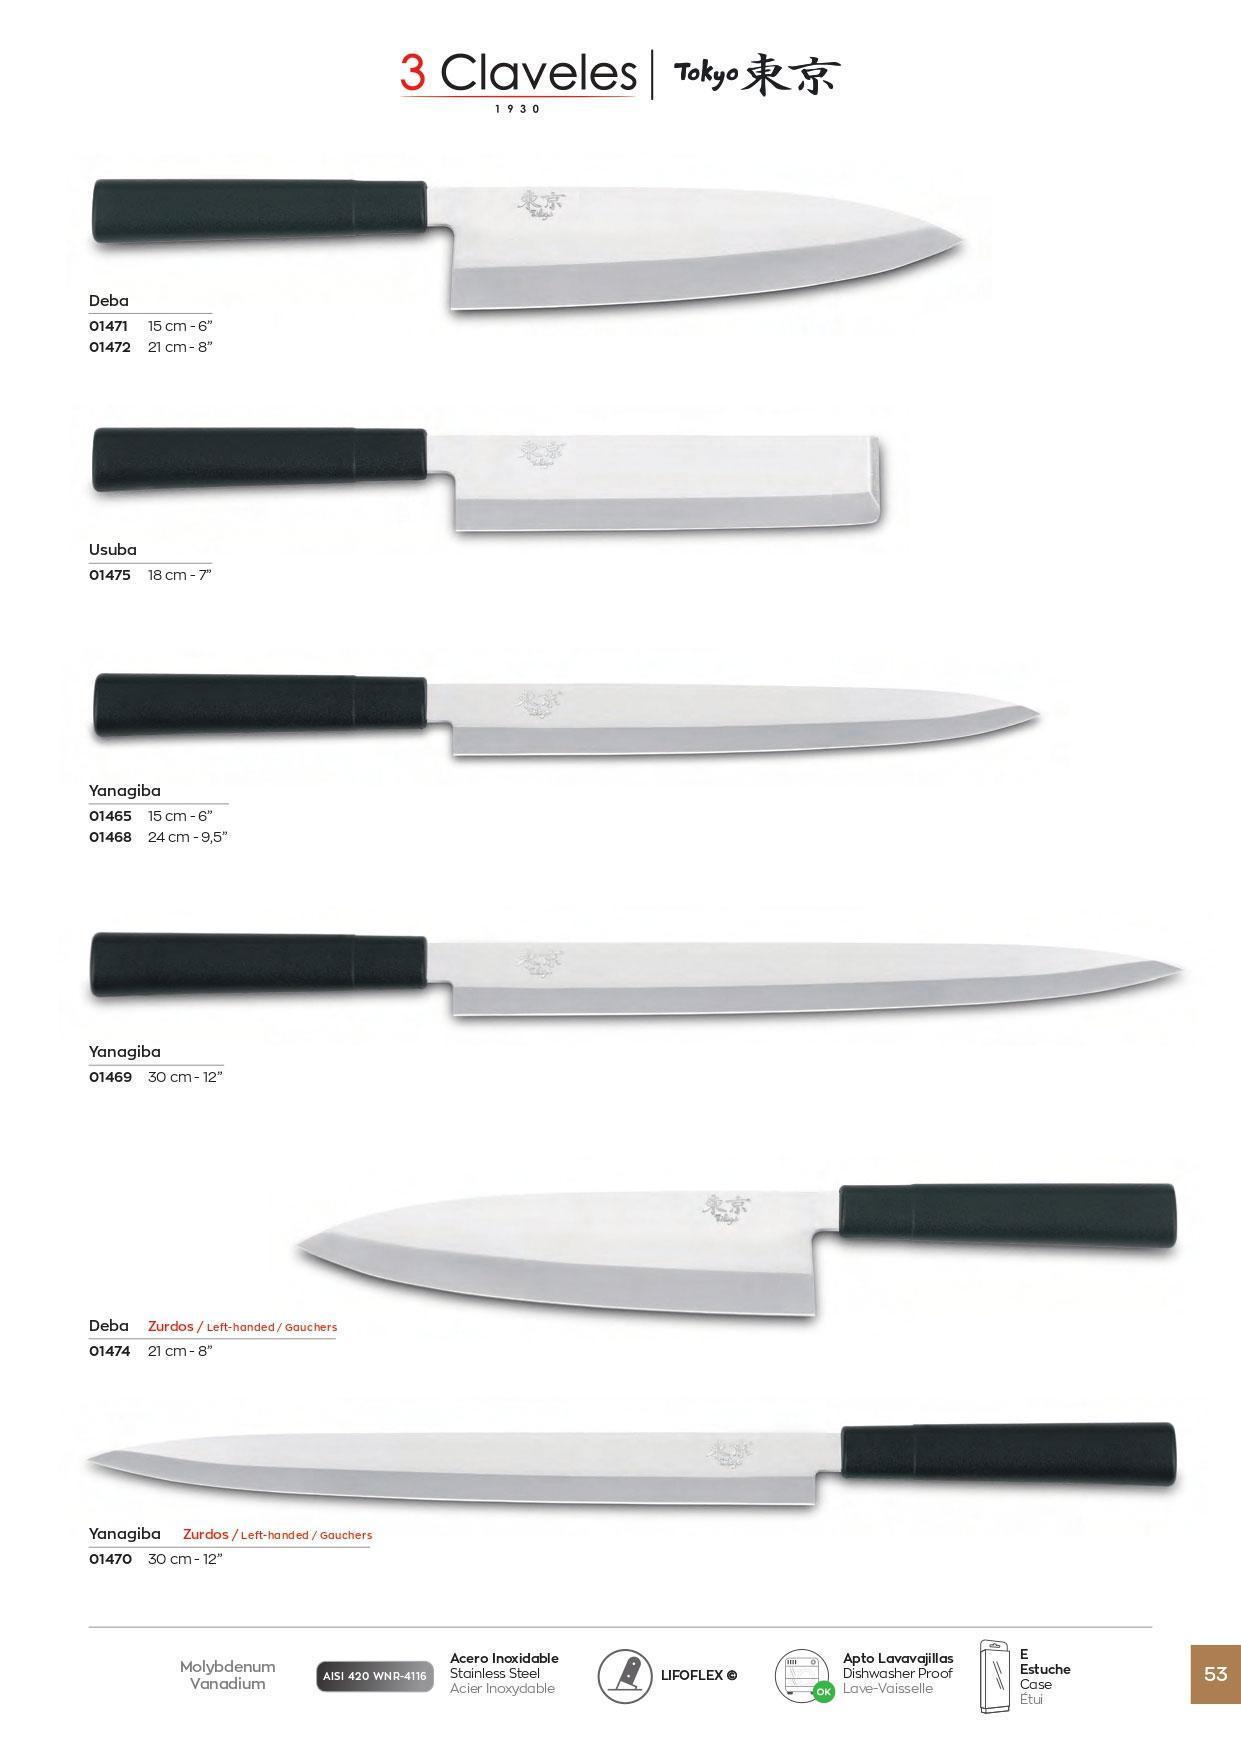 professional knives cook cuchillos cocina tokyo 3